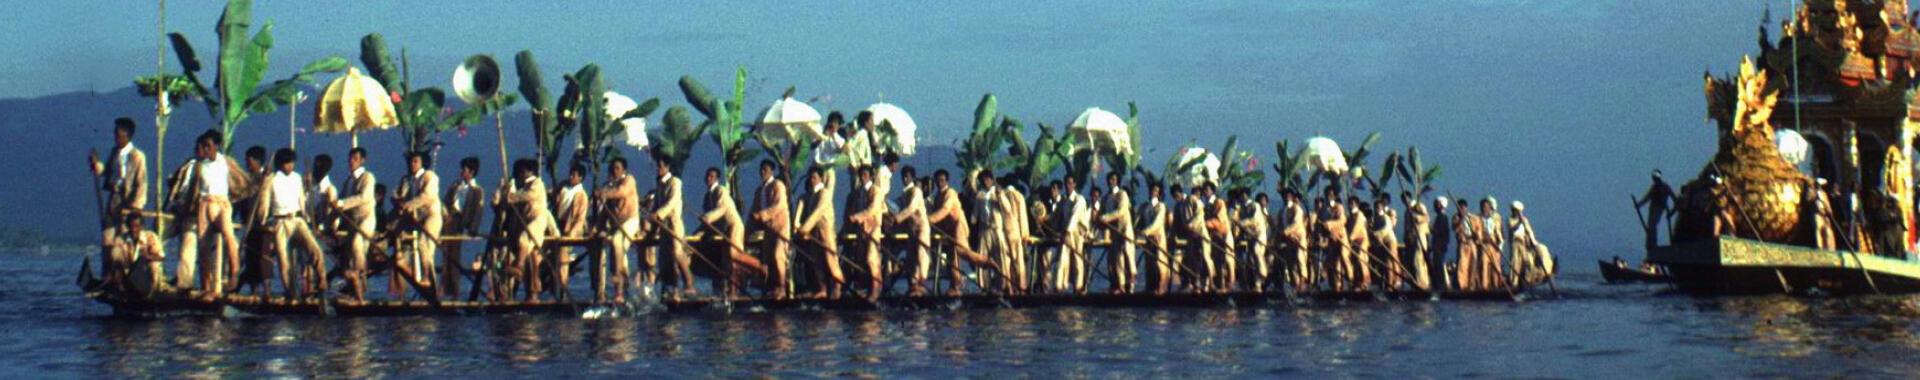 Phaung Daw Oo Festival, Inlé Lake, Shan State, Myanmar/Alain